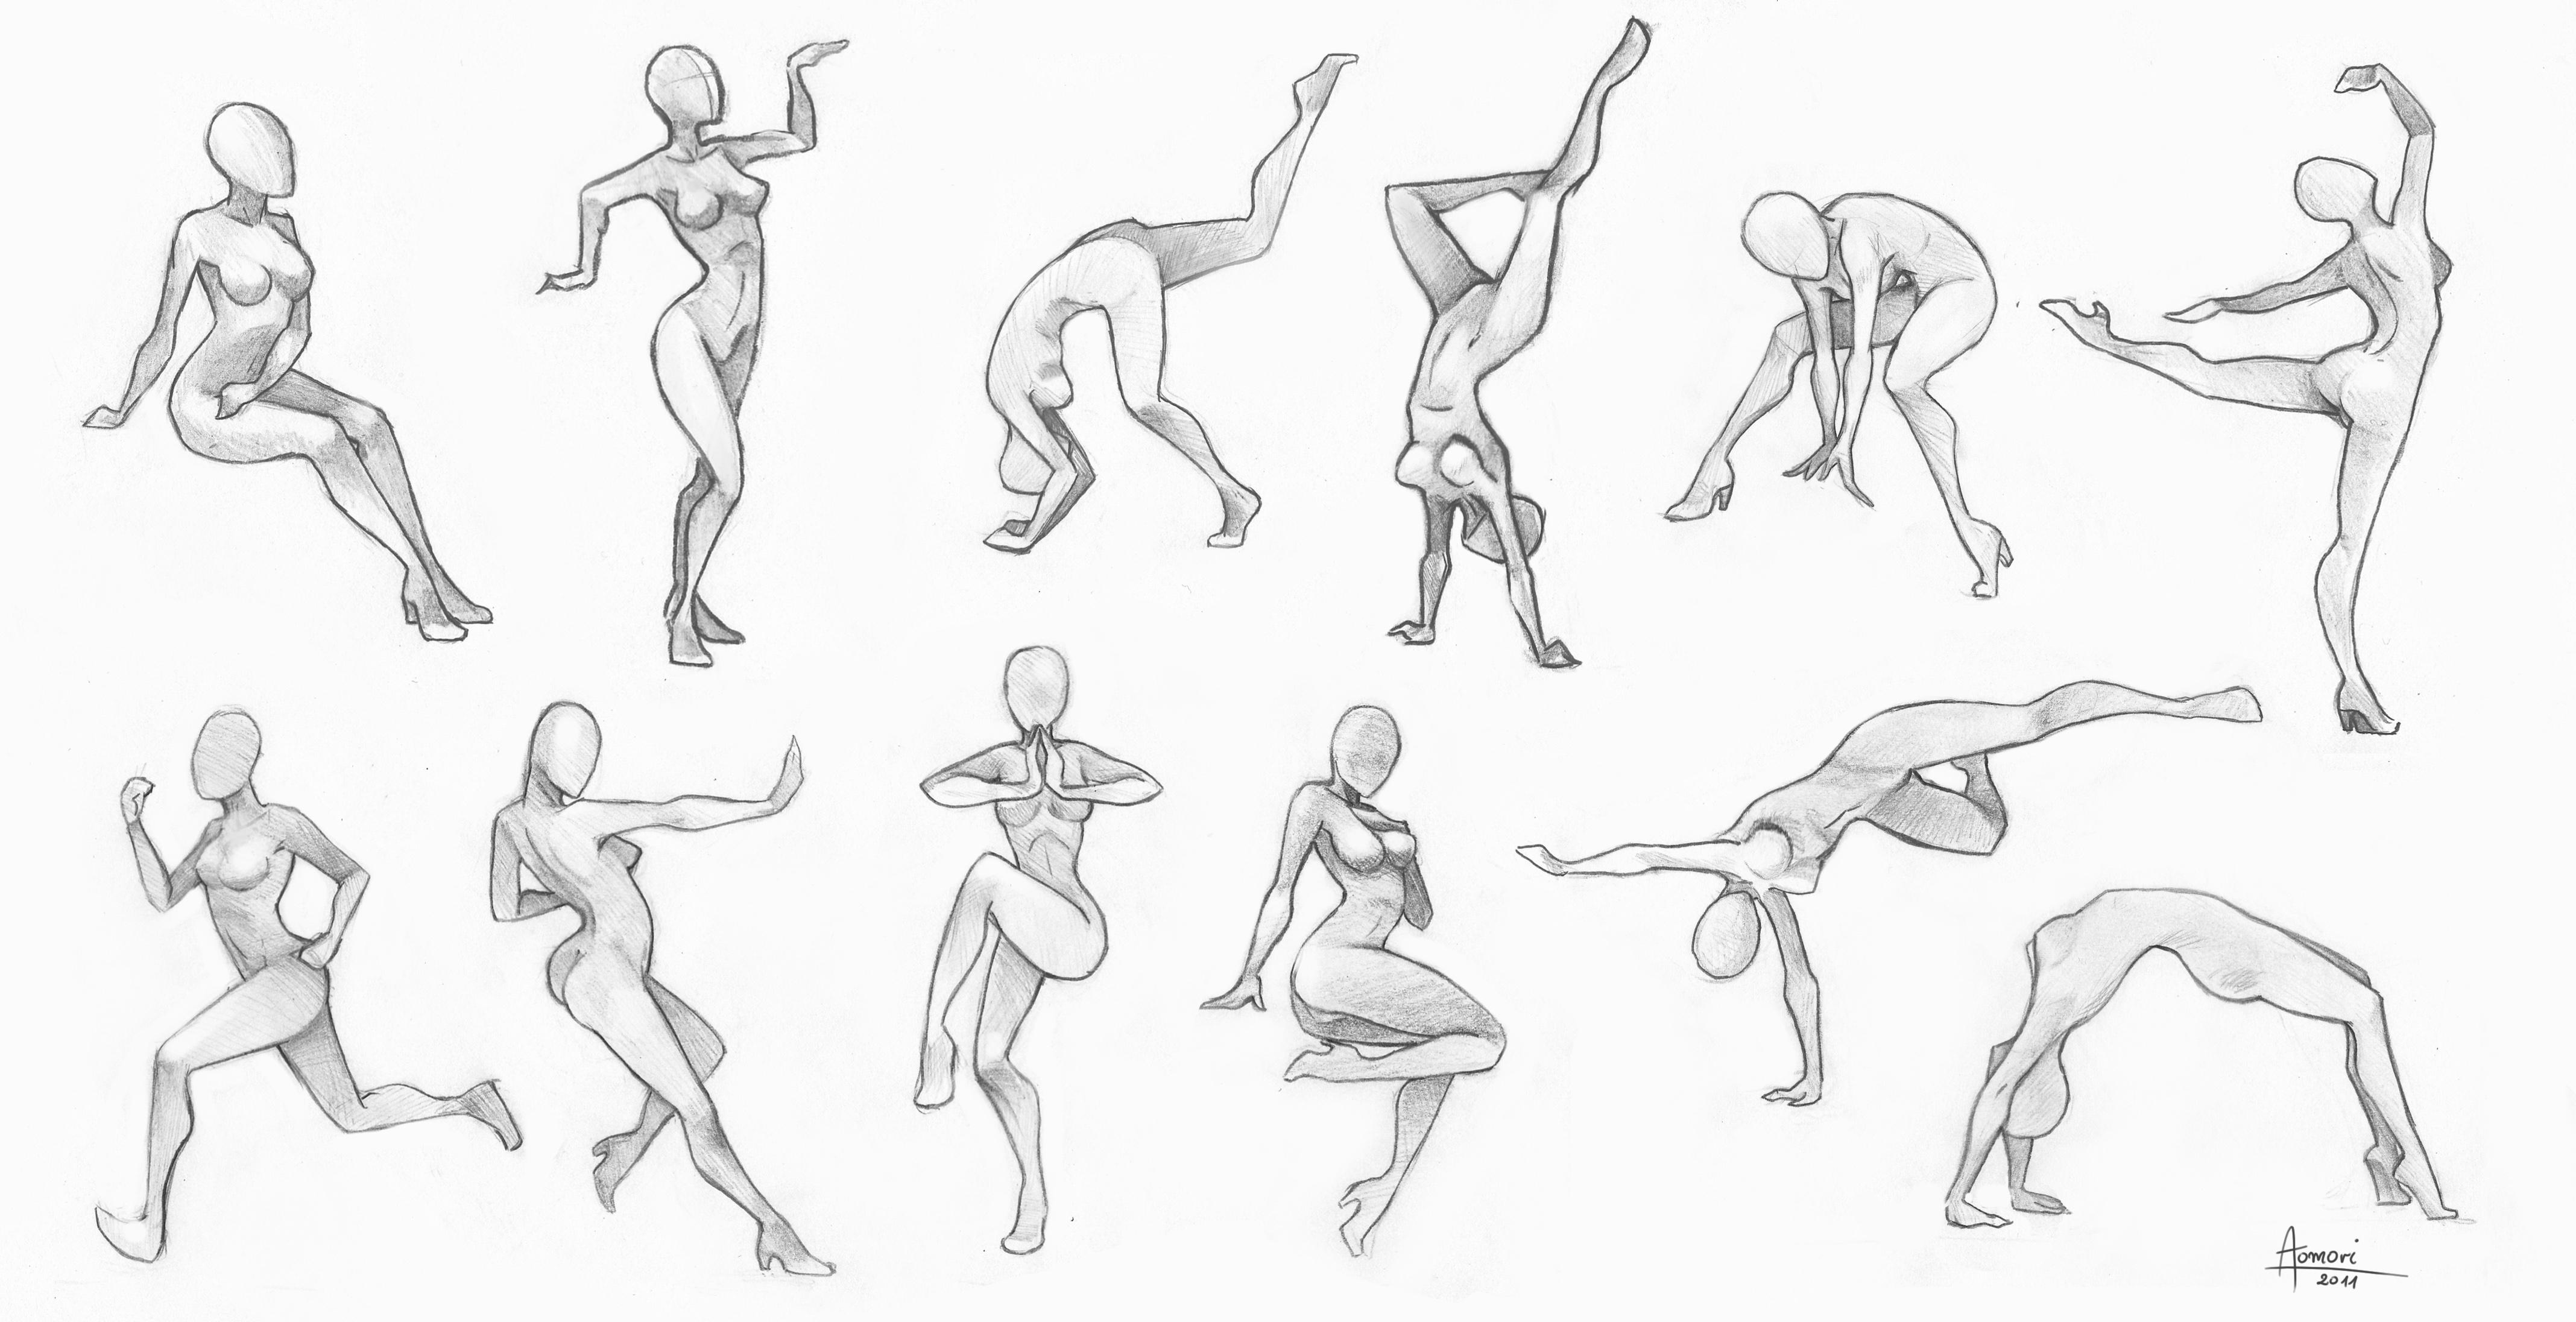 Cartoon pancil art pron sex nude clip